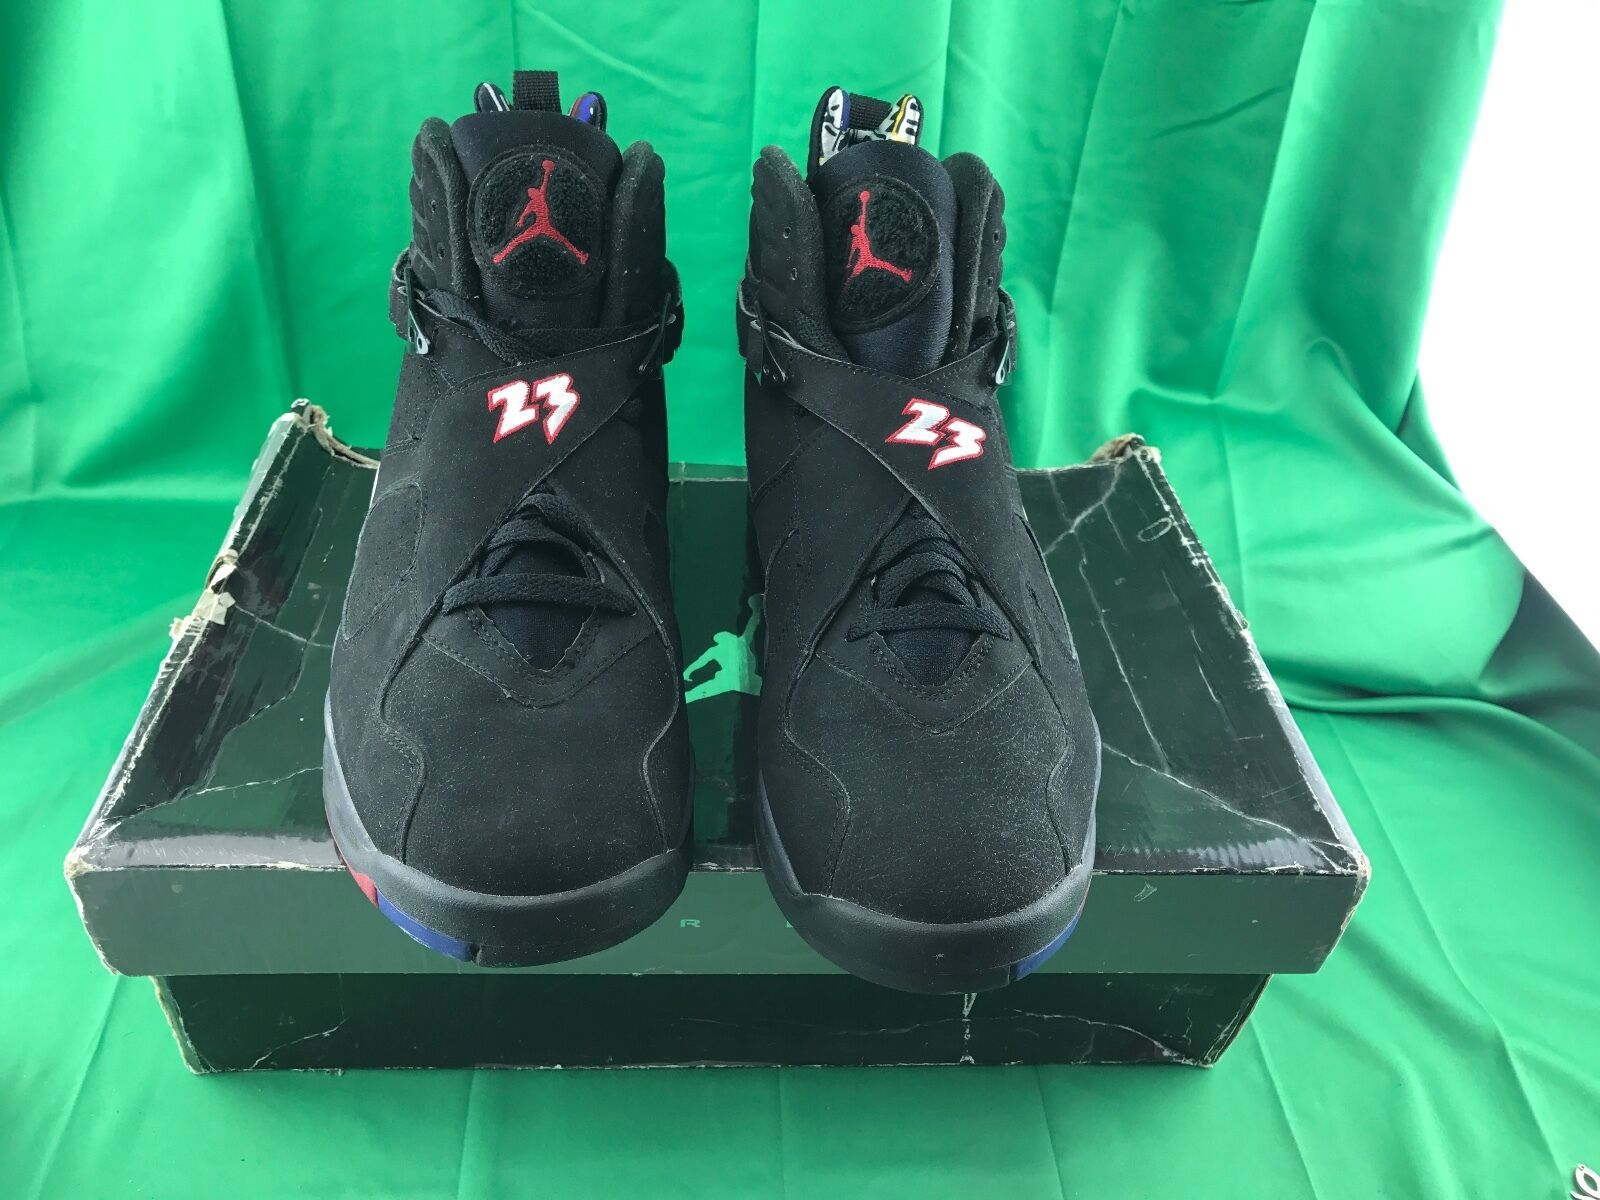 2007 Nike Air Jordan Retro VIII 8 Playoff SZ 12 305381-061 Used Black